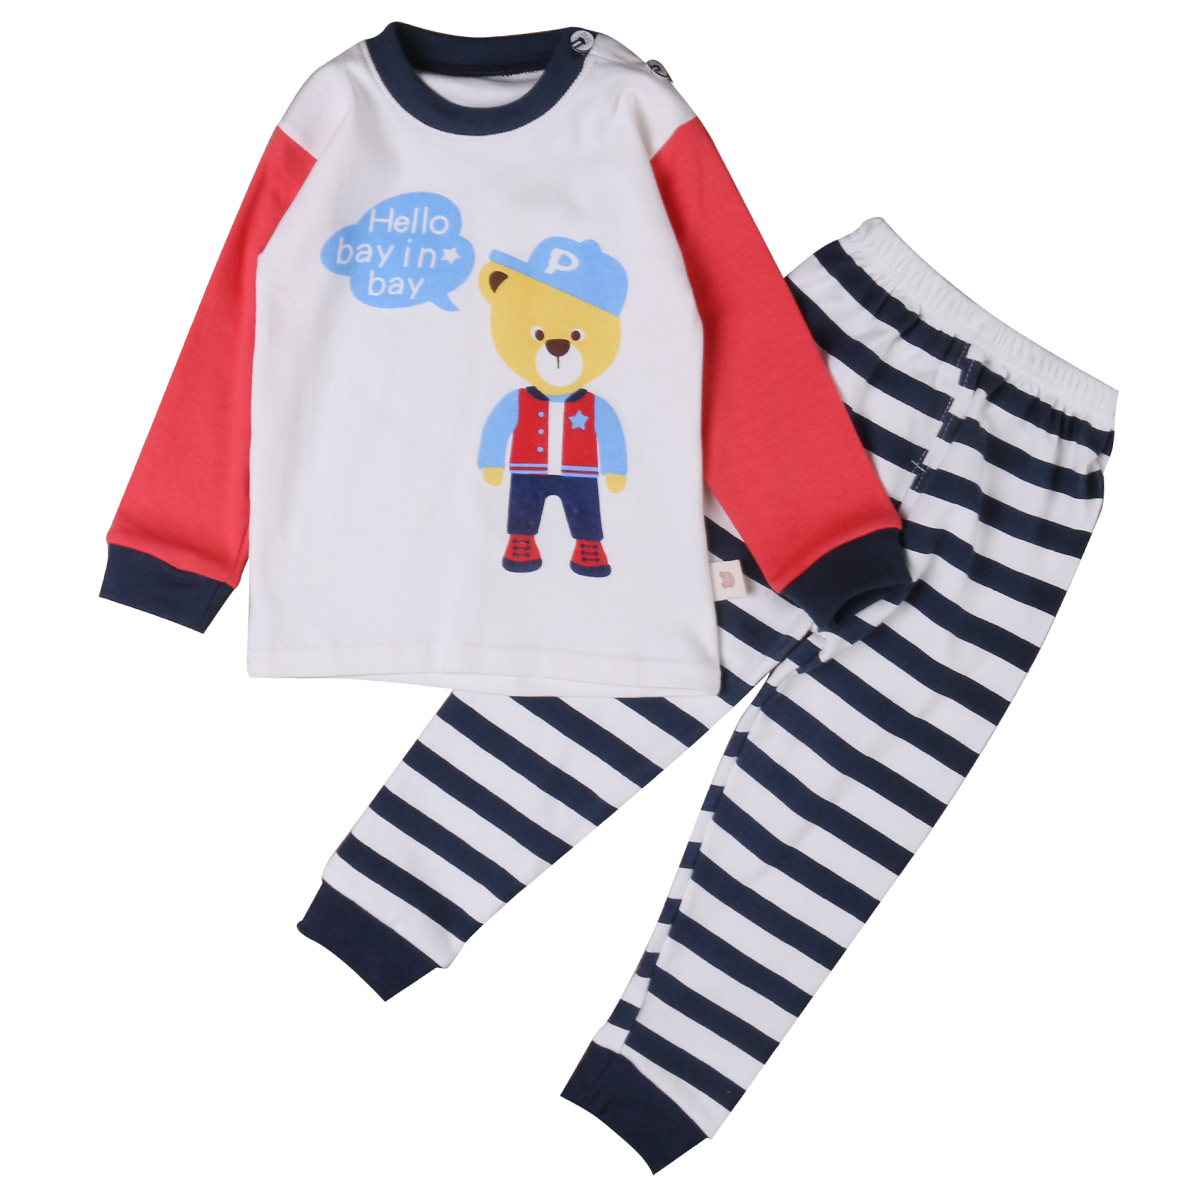 2016 Autumn children baby boys girls clothing sets cotton casual set kids printed t-shirt+pants 2pcs outfit clothes set<br><br>Aliexpress